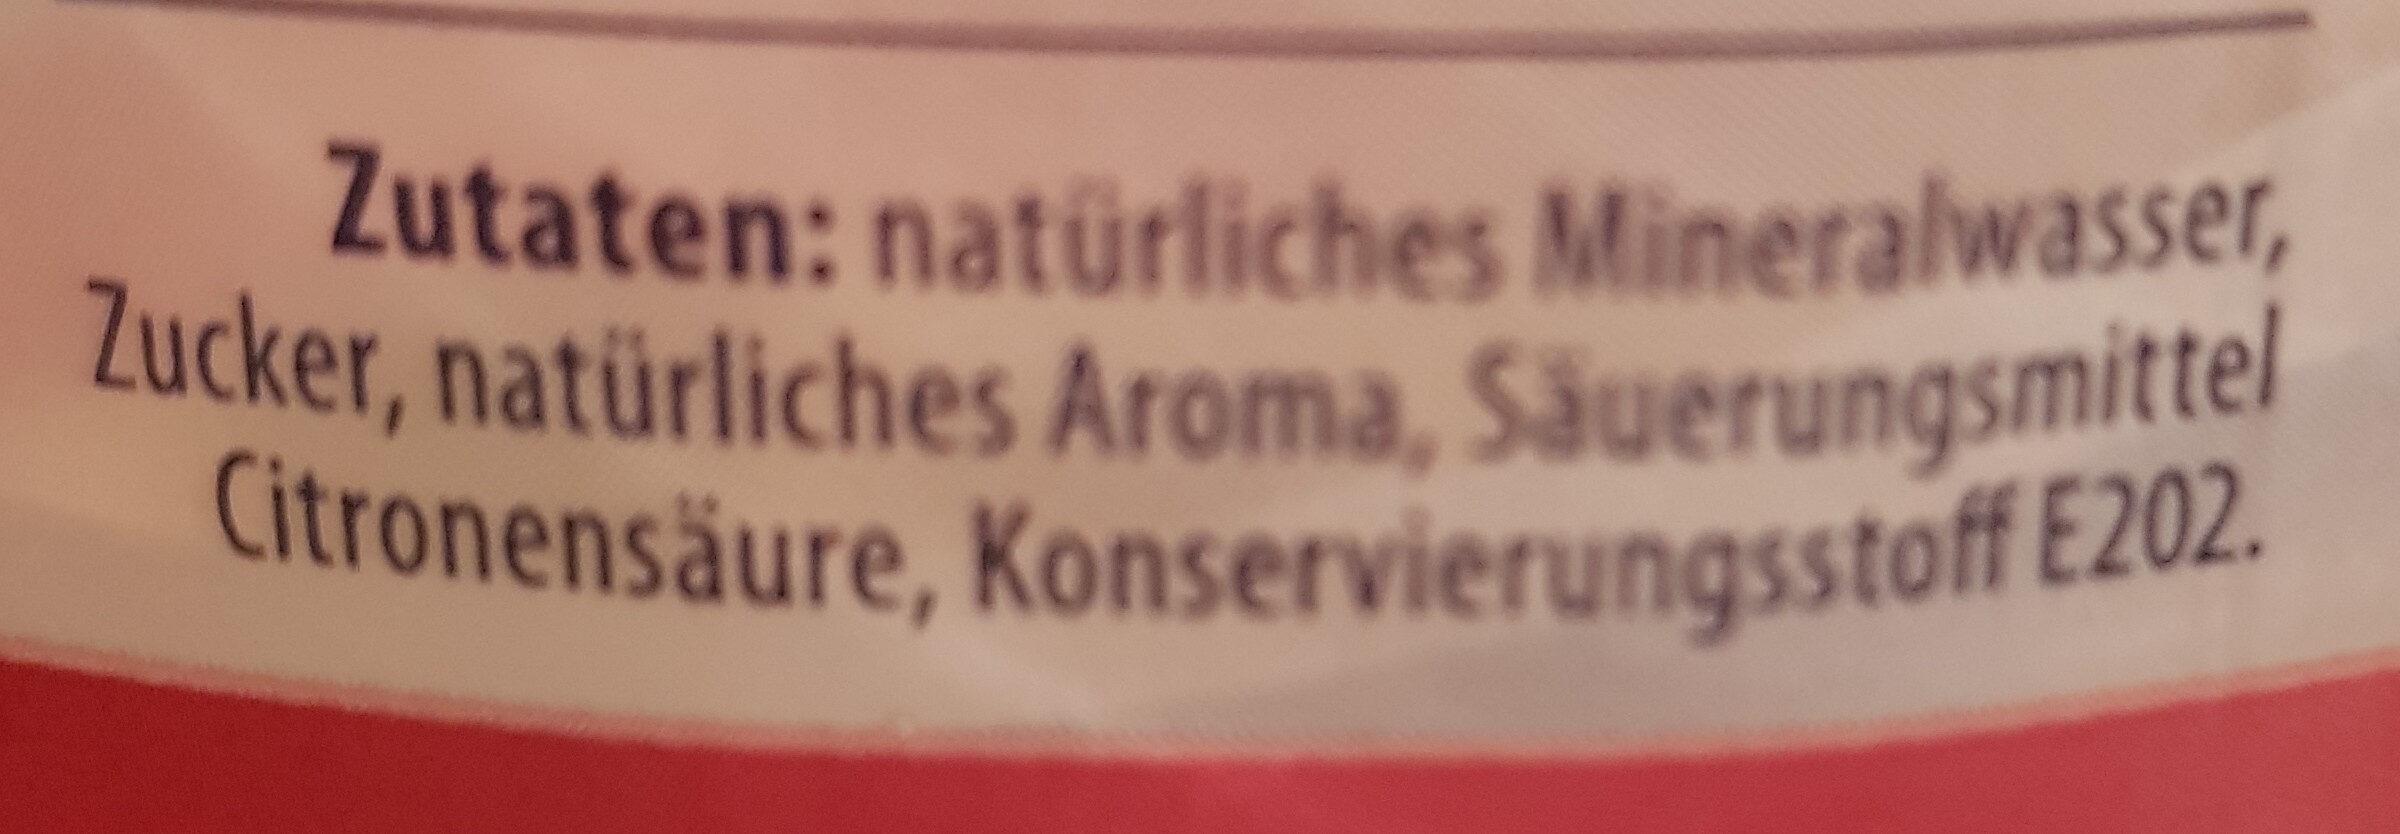 Erfrischungsgetränk mit Kirschgeschmack - Ingredients - de